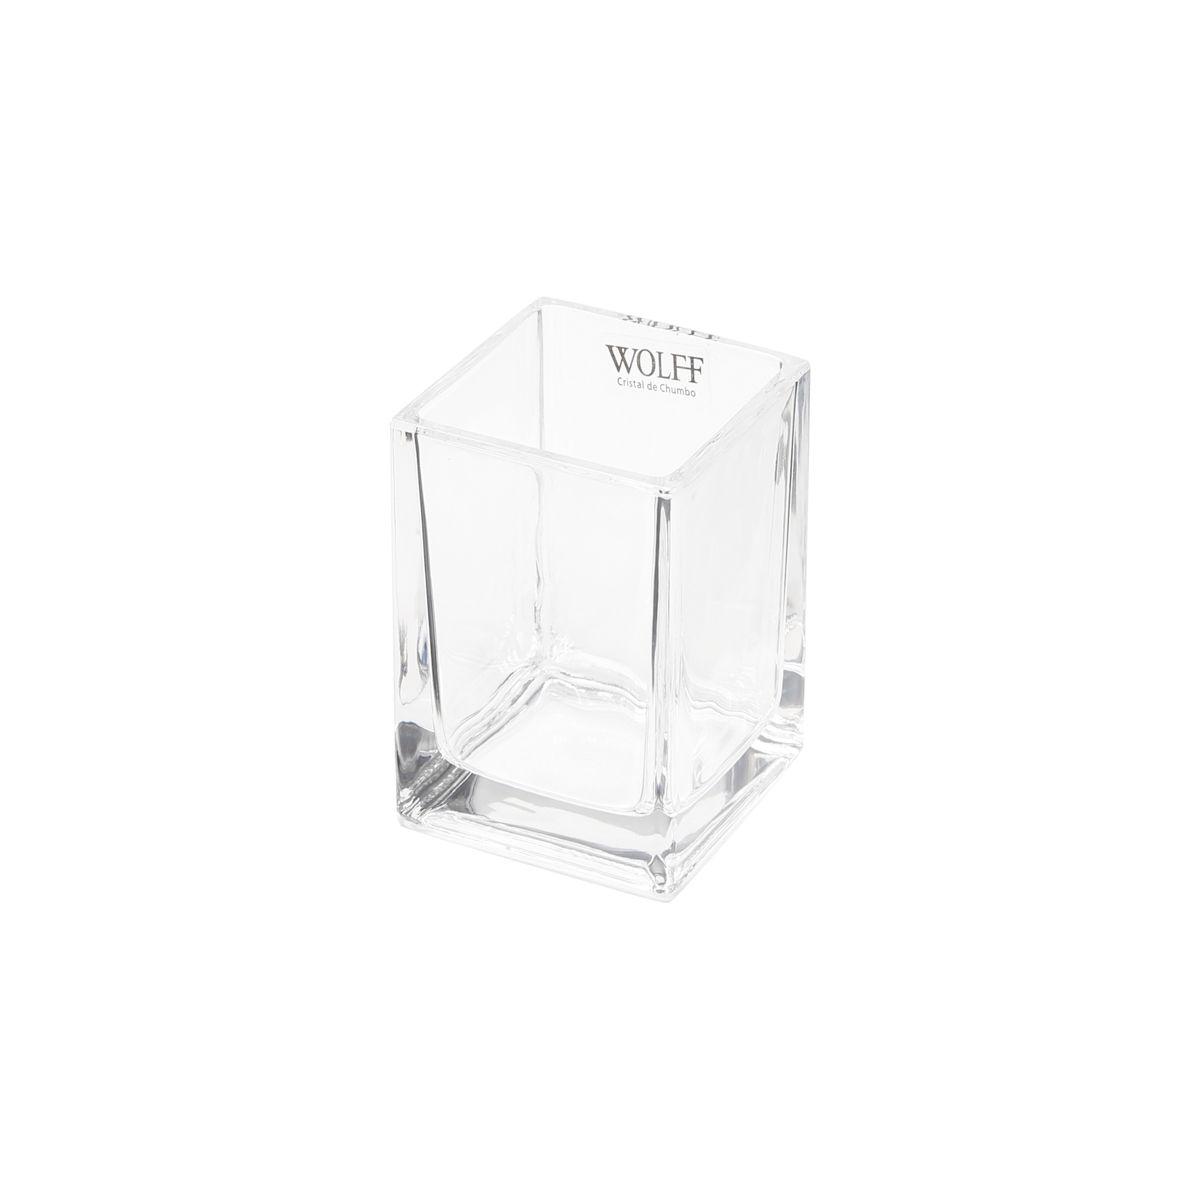 Porta Talheres de Cristal de Chumbo e Aço Inox Torcello Wolff